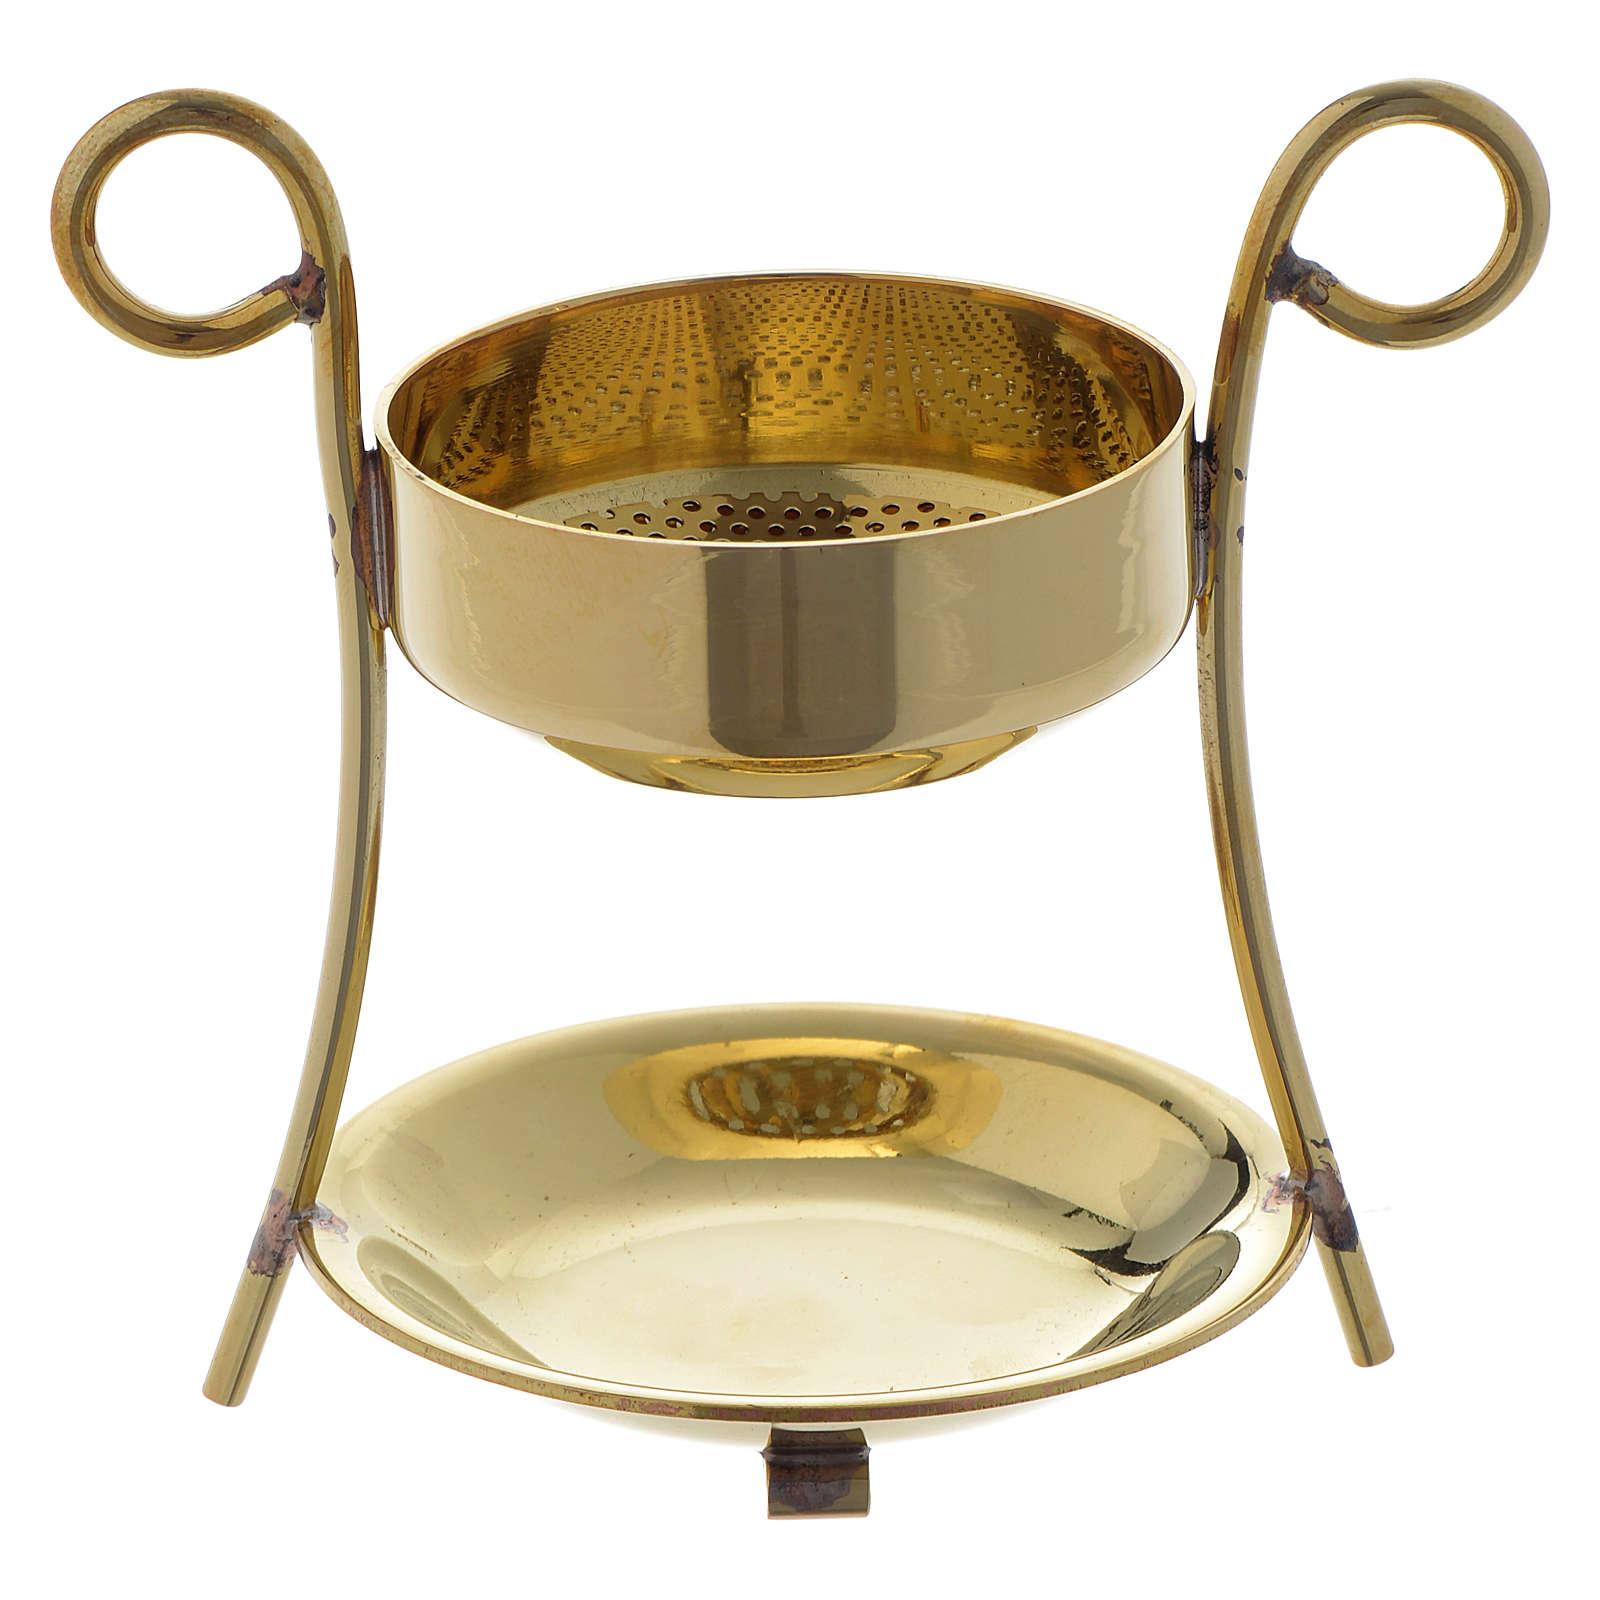 Incense burner simple style in golden brass 3